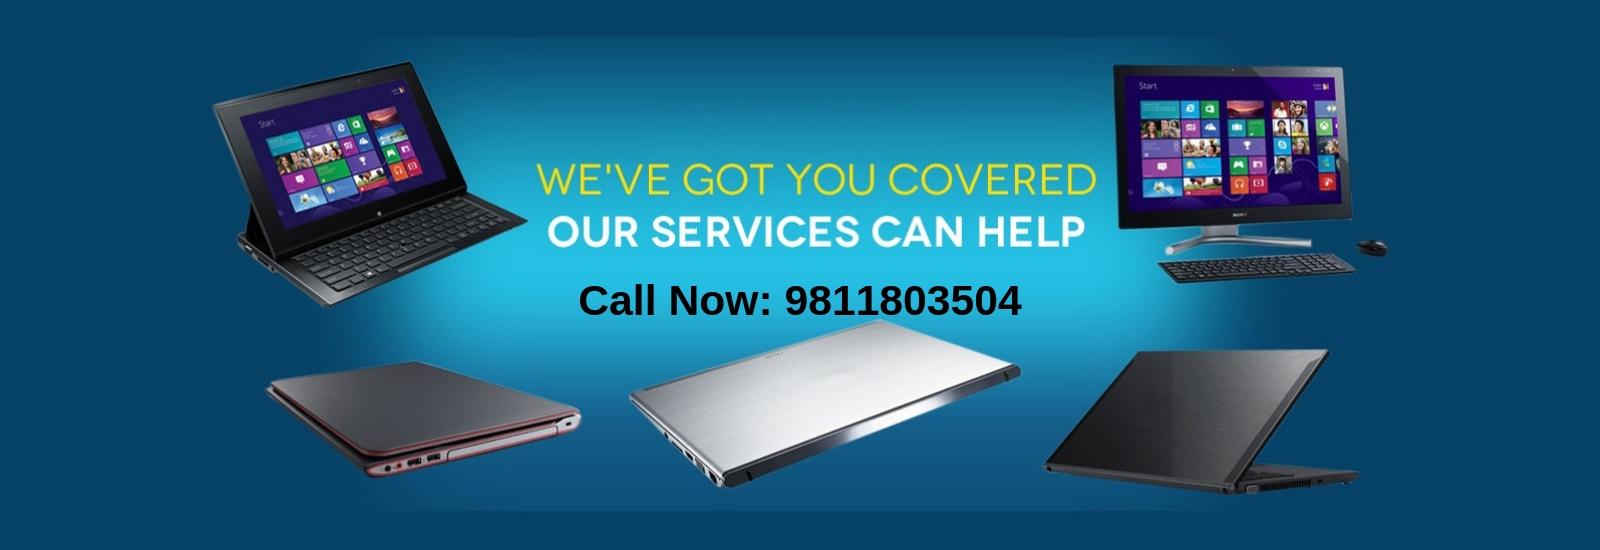 laptop repair in Delhi, laptop repair in Delhi NCR, Printer repair in Delhi, Printer repair in Delhi NCR, AMC Services west bb